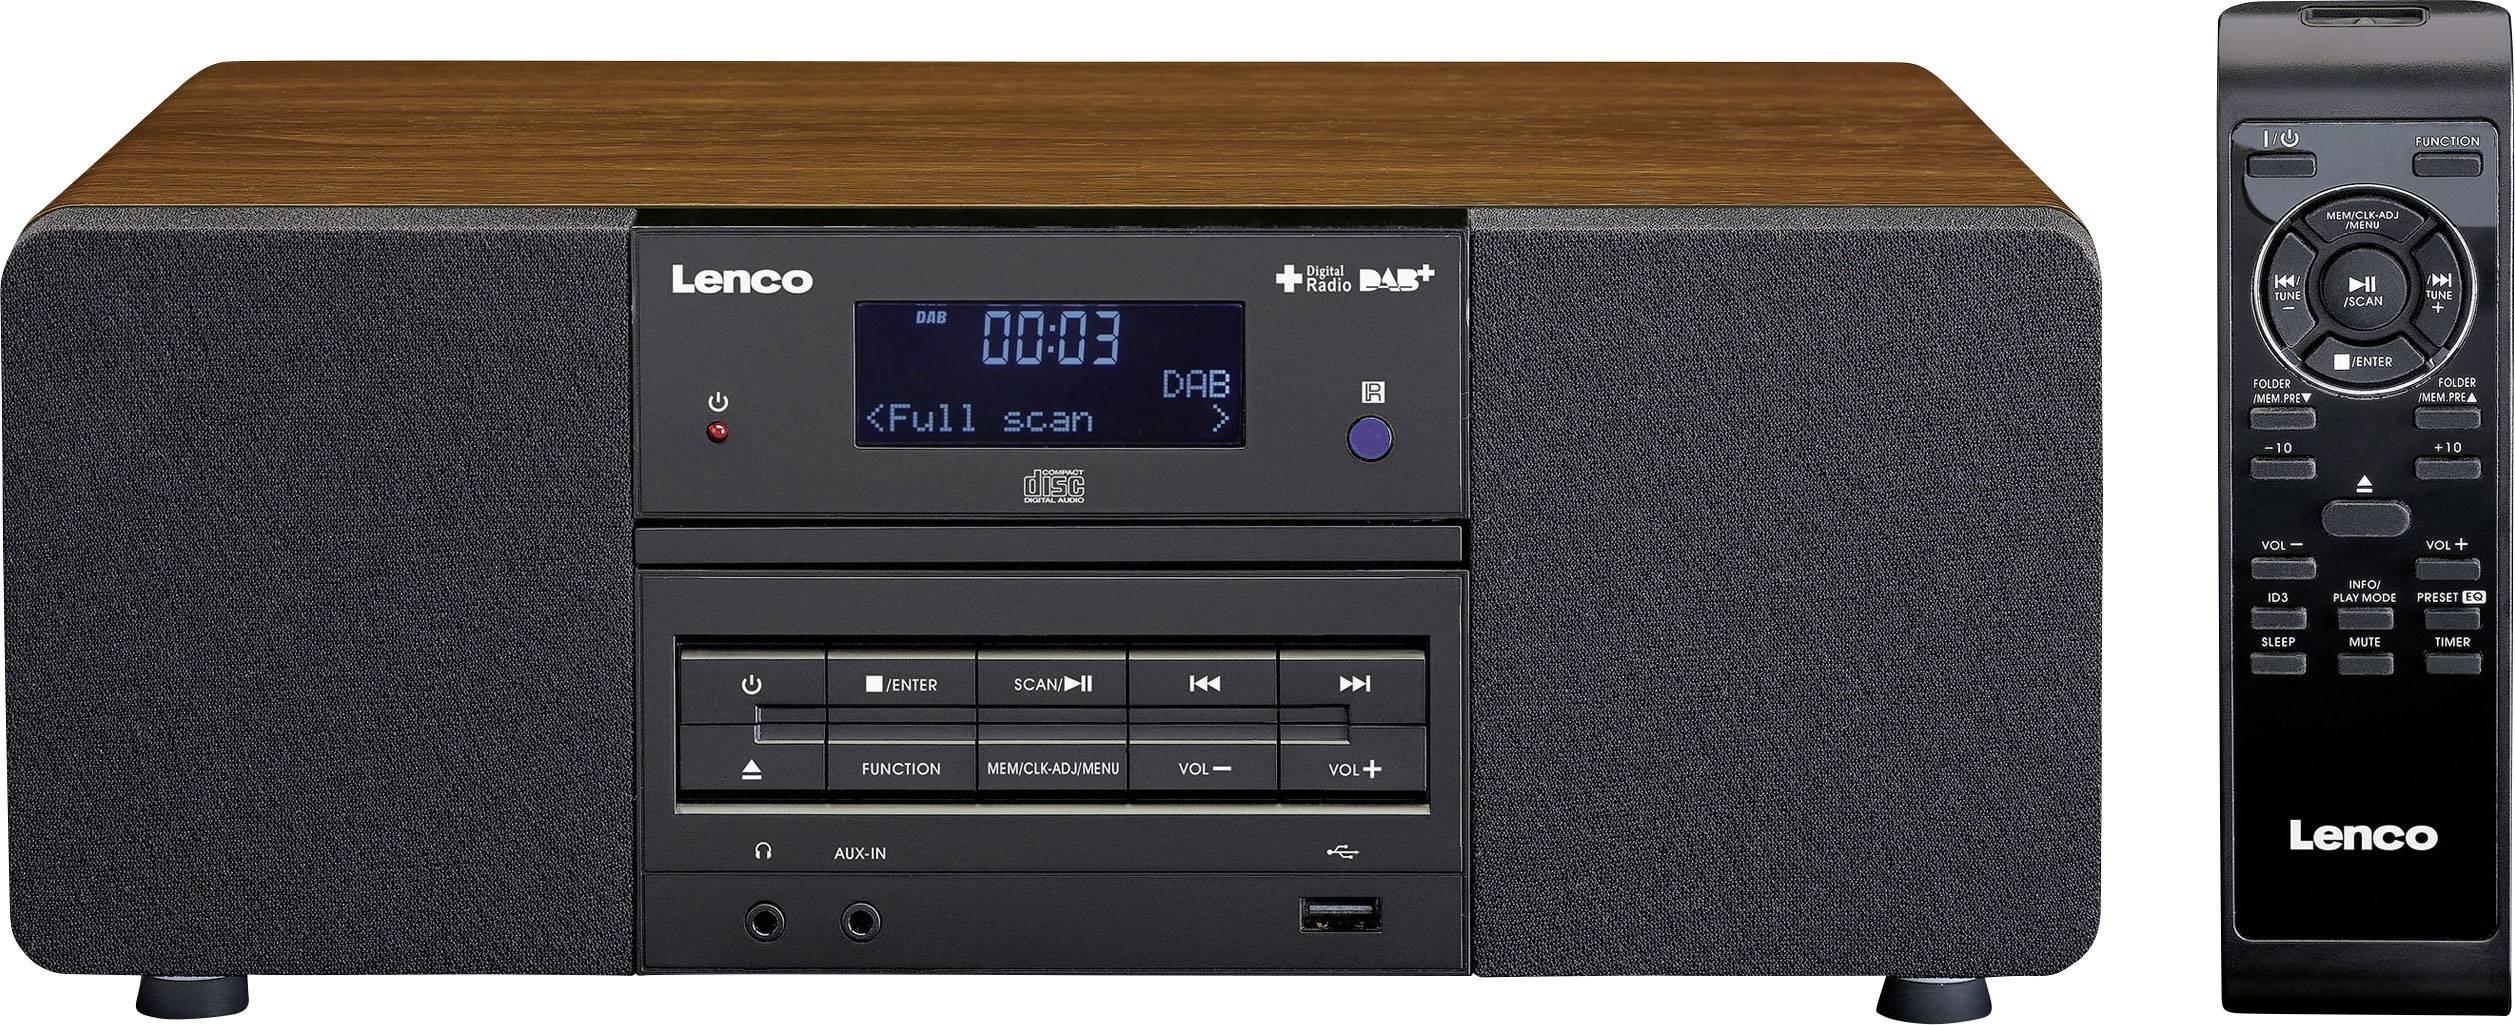 DAB+ stolní rádio Lenco DAR-050, CD, USB, AUX, DAB+, dřevo